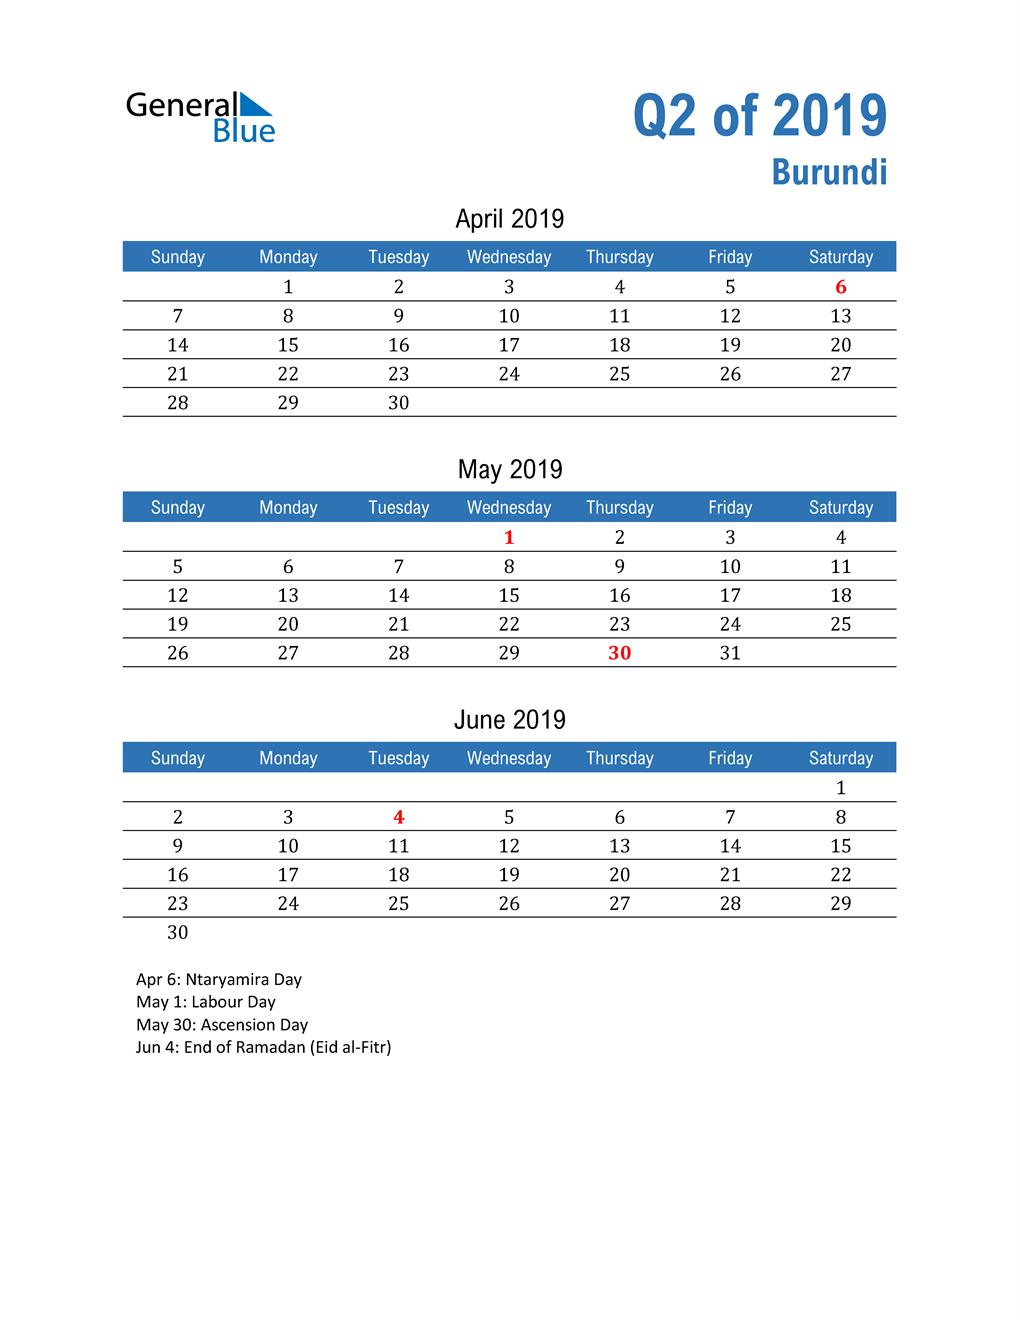 Burundi 2019 Quarterly Calendar